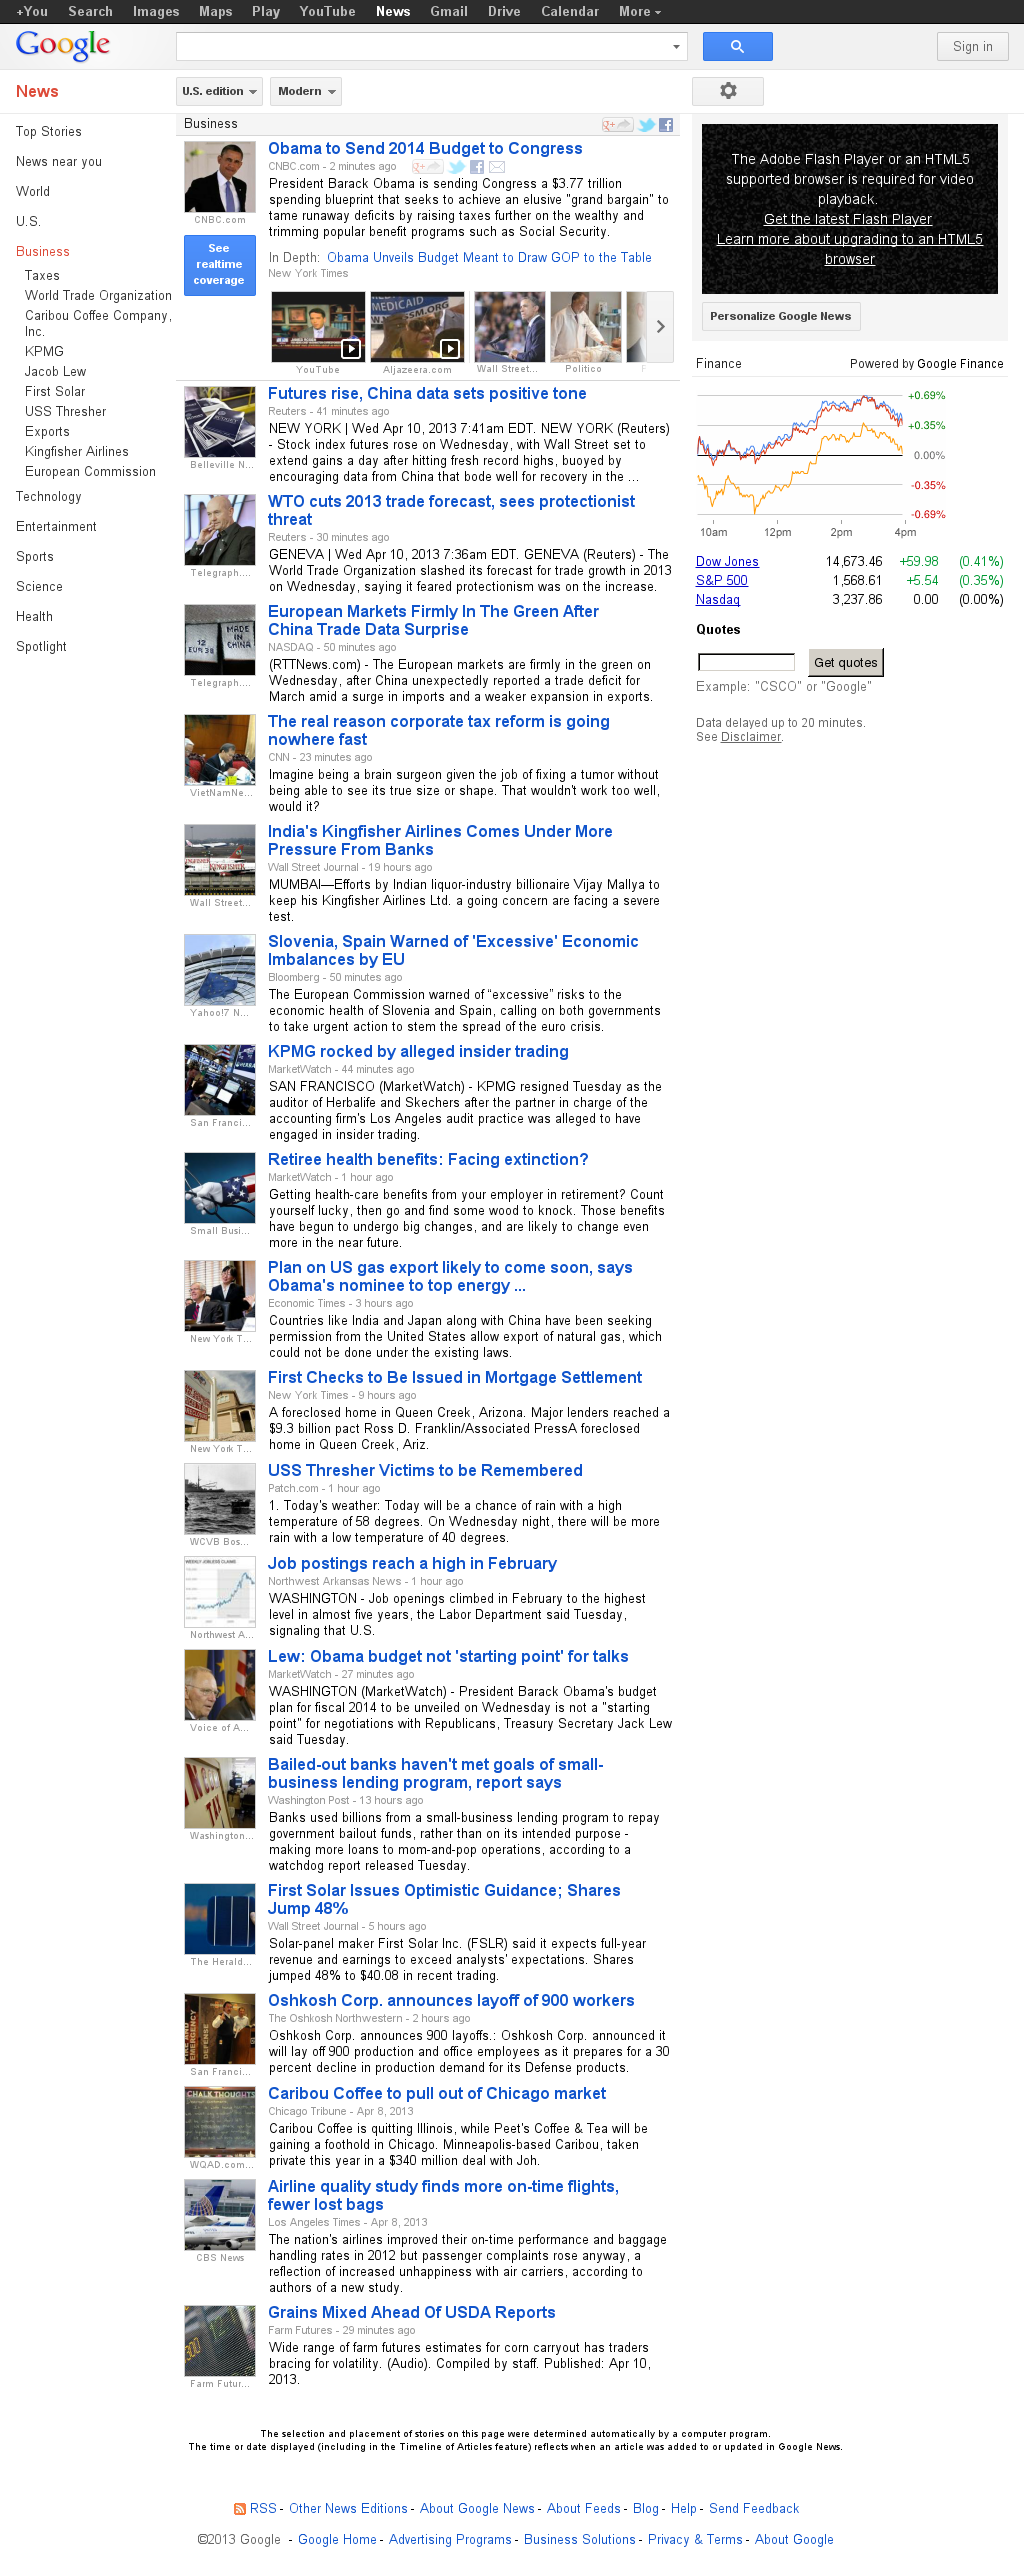 Google News: Business at Wednesday April 10, 2013, 12:07 p.m. UTC